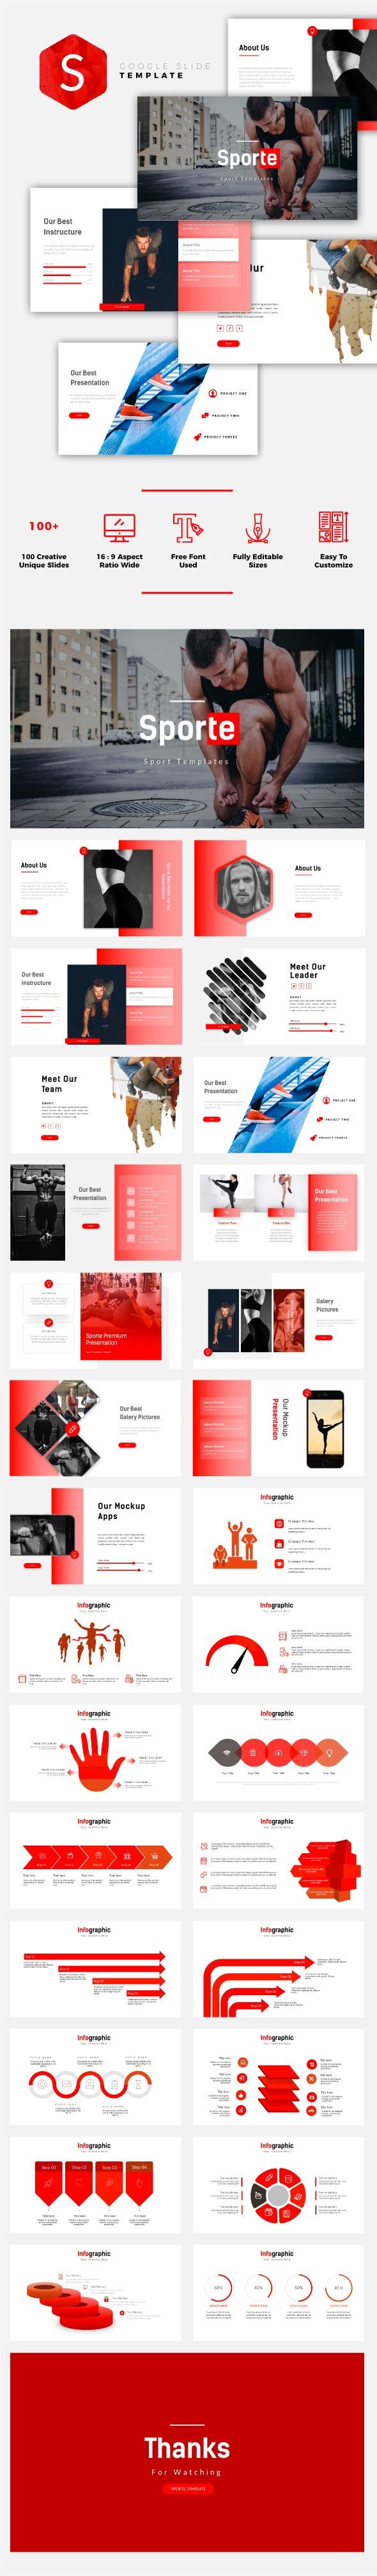 Sporte - Sport Google Slides Template - Google Slides Presentation Templates